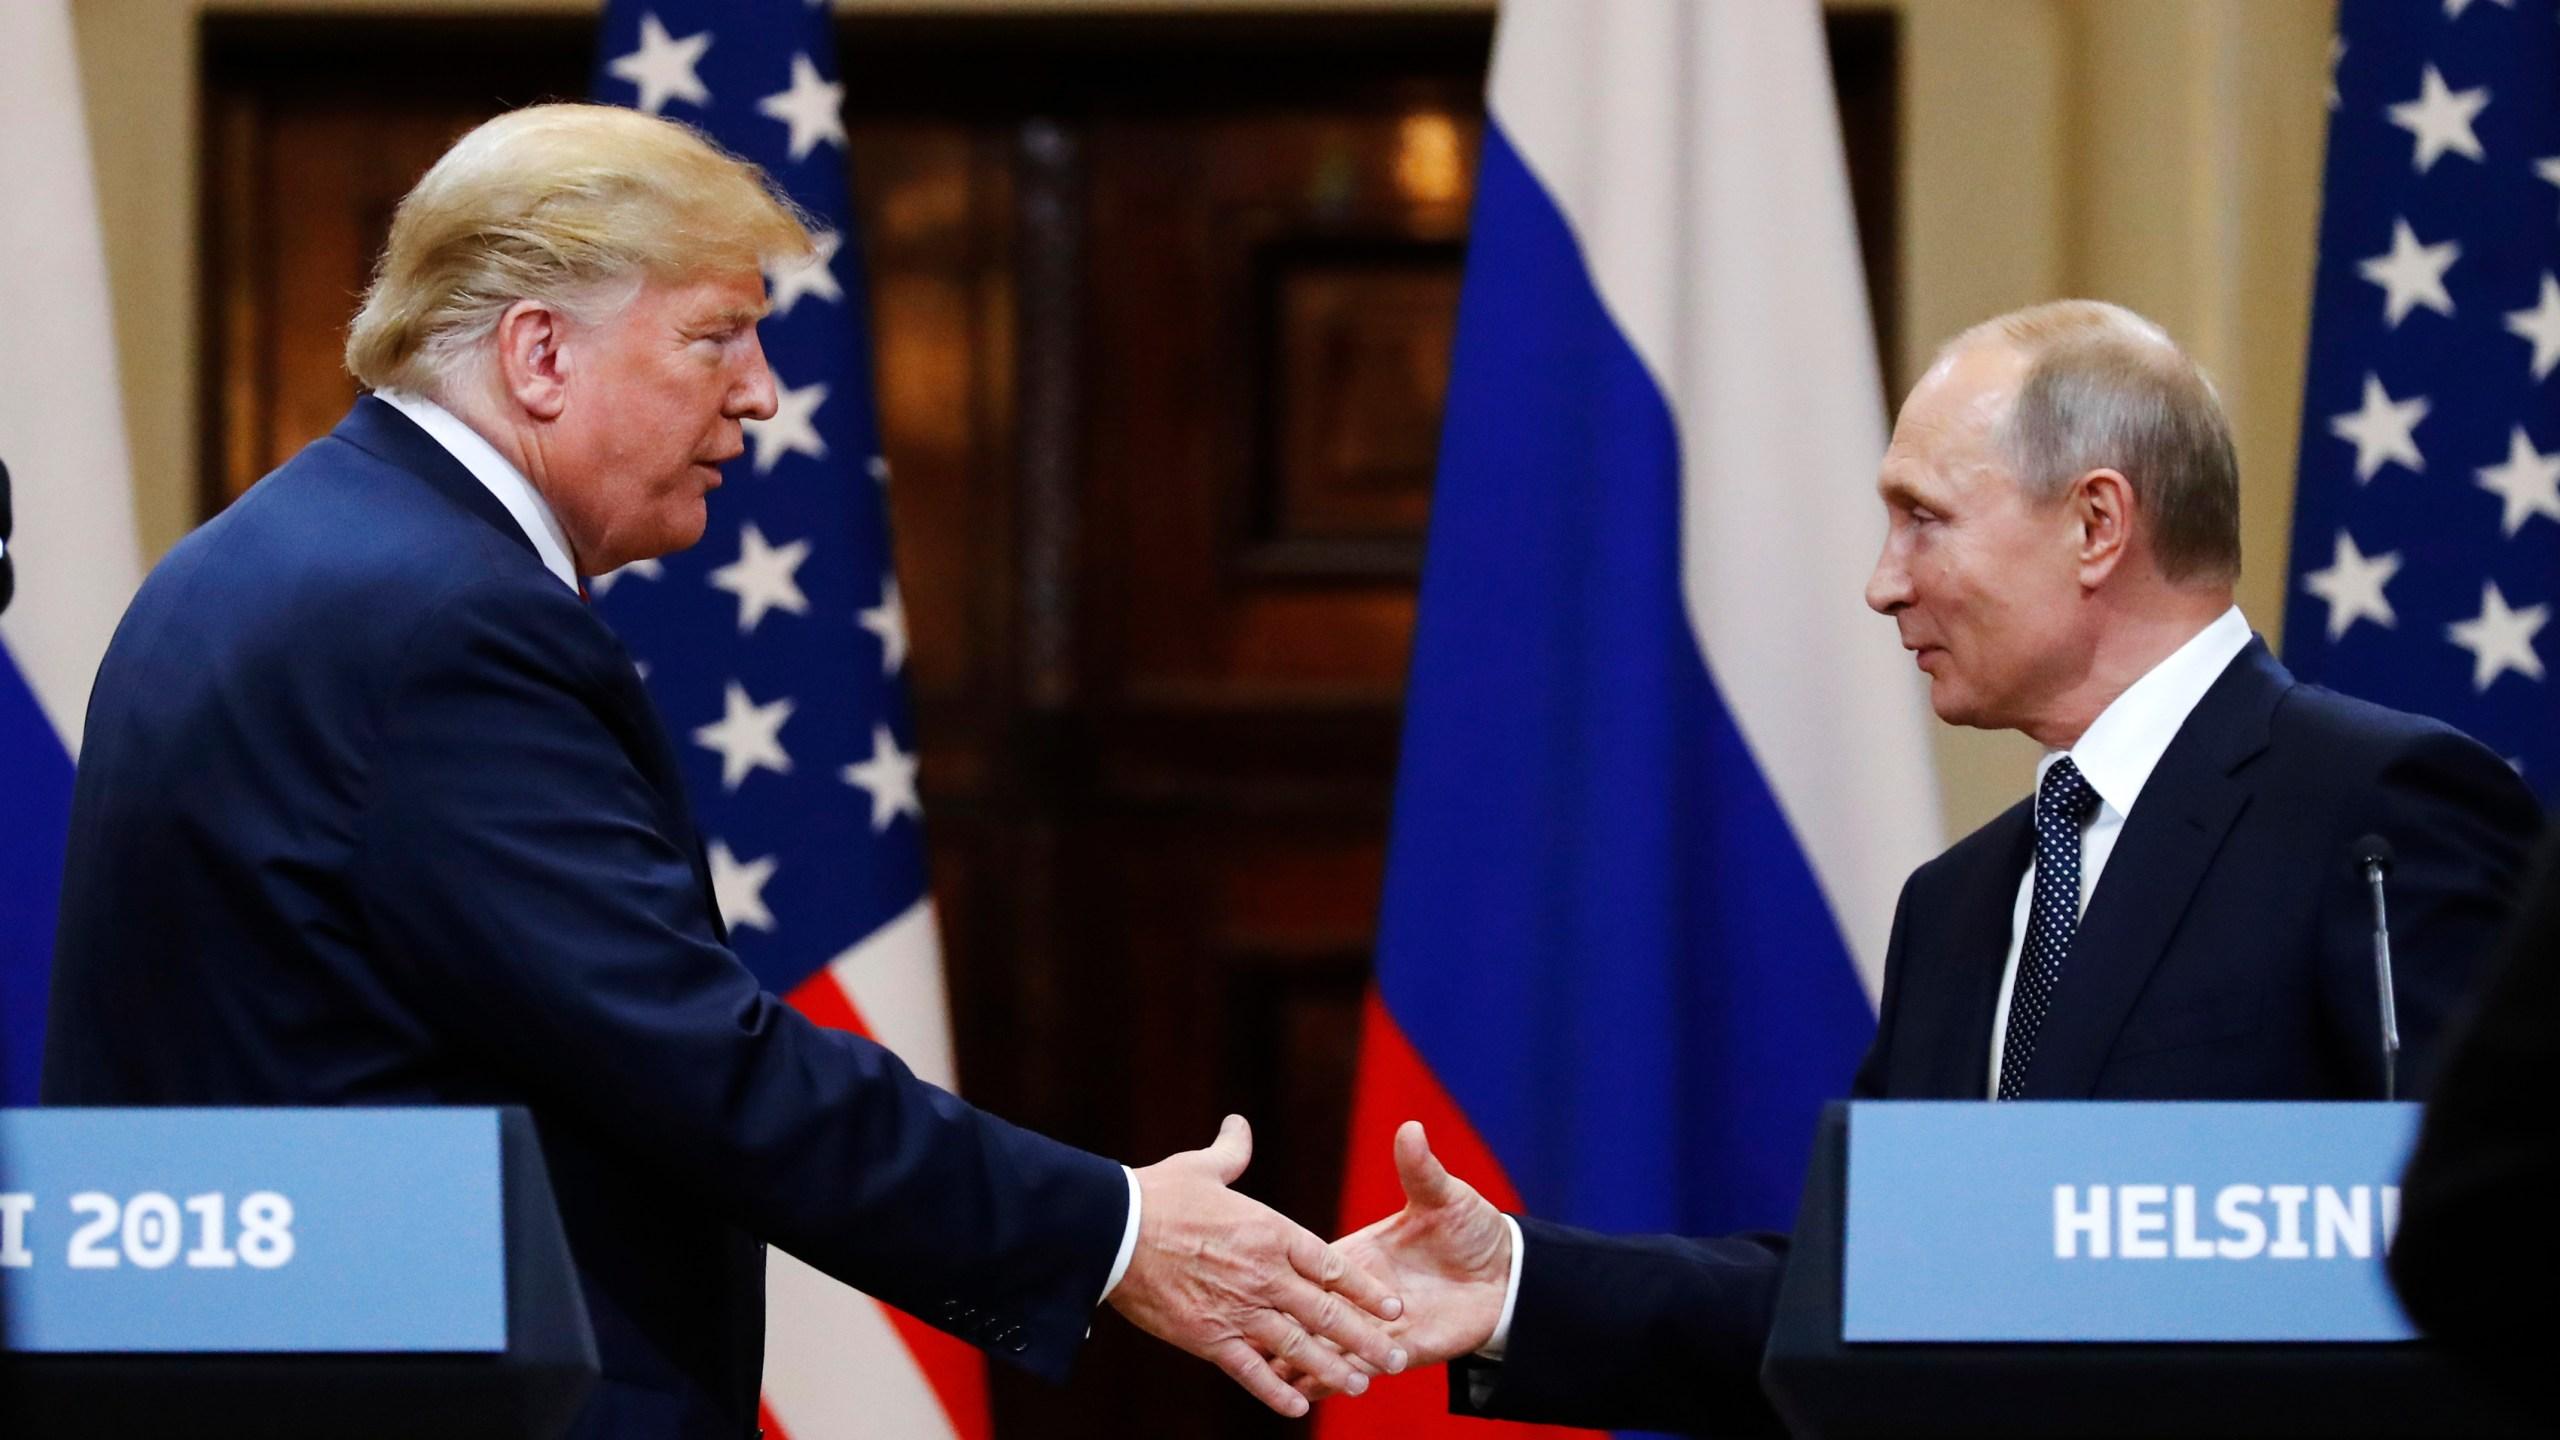 APTOPIX_Finland_Trump_Putin_Summit_66350-159532.jpg47569069